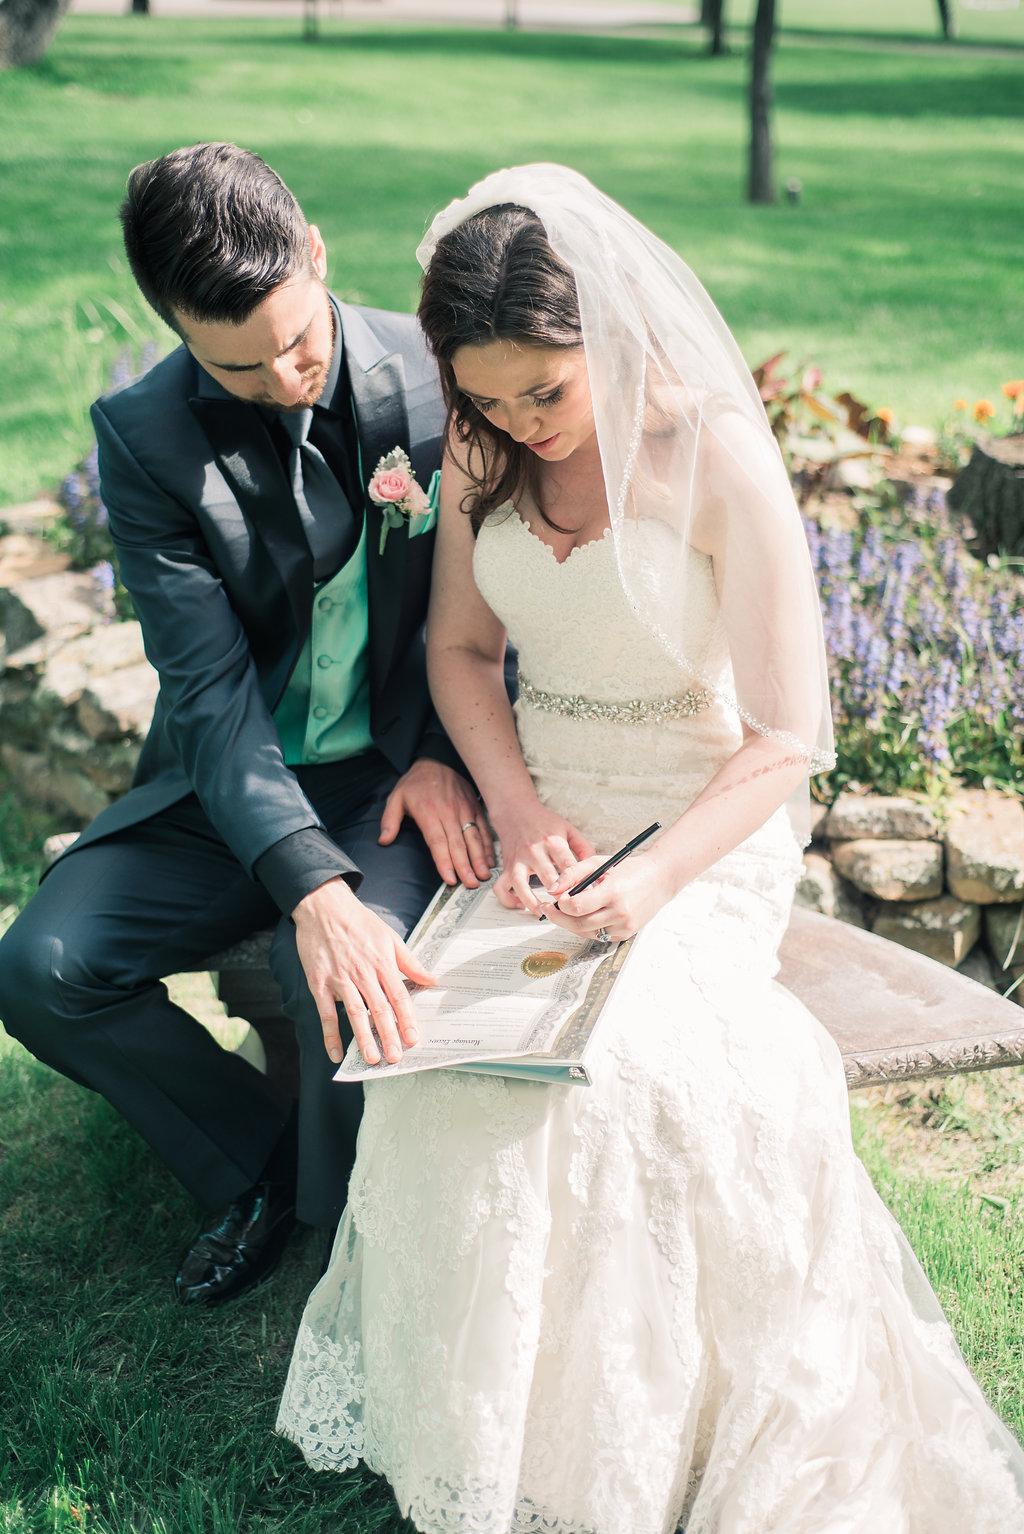 20170527_Roberts_Wedding_0023.jpg